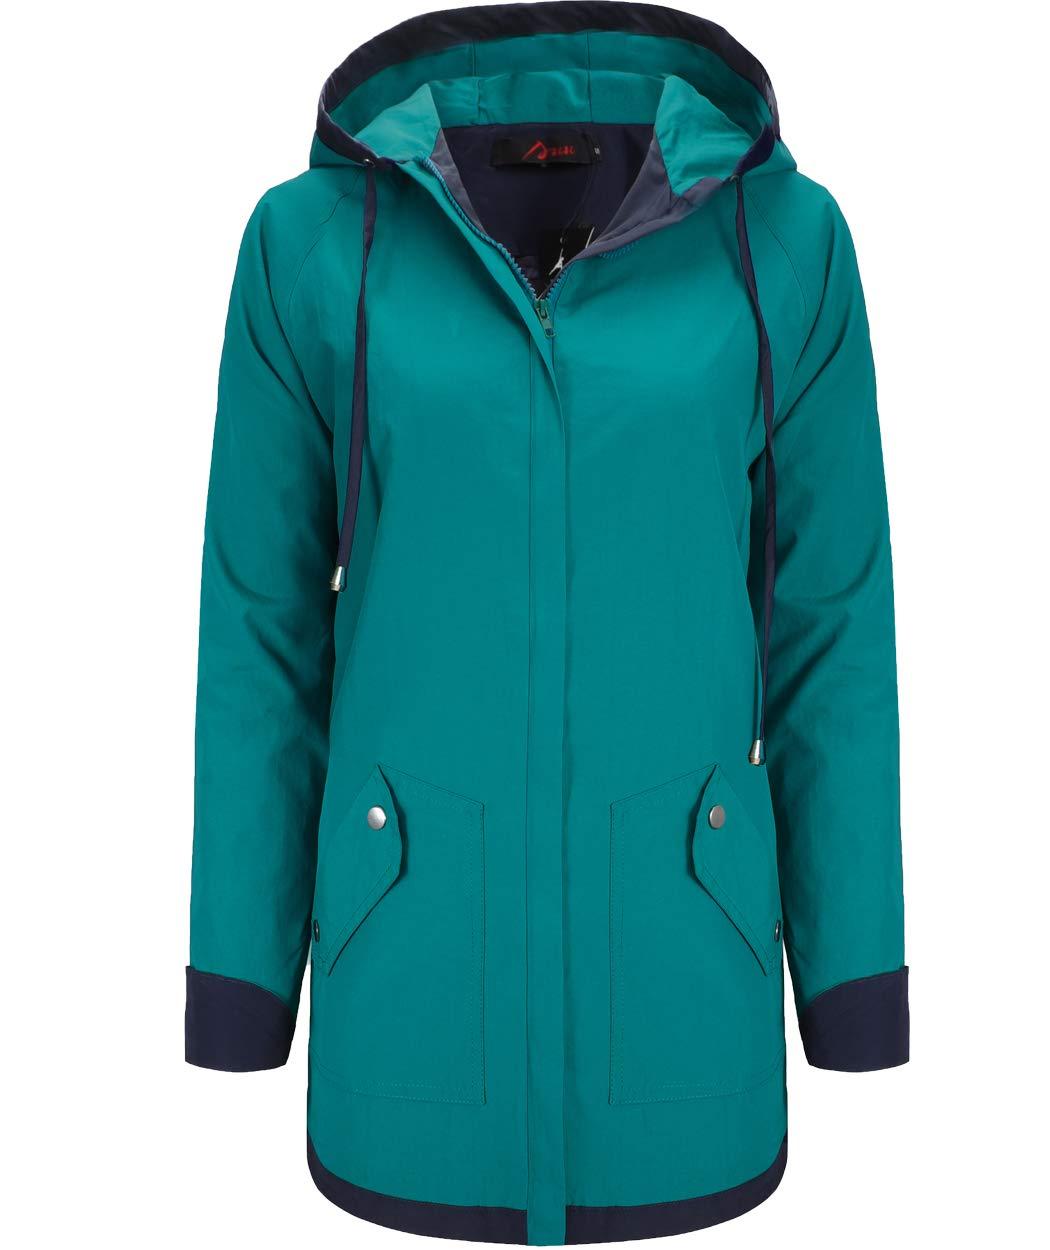 AUU Women's Rain Jacket Waterproof Hooded Raincoat Lightweight Outdoor Patchwork Windbreaker with Lined and Pockets